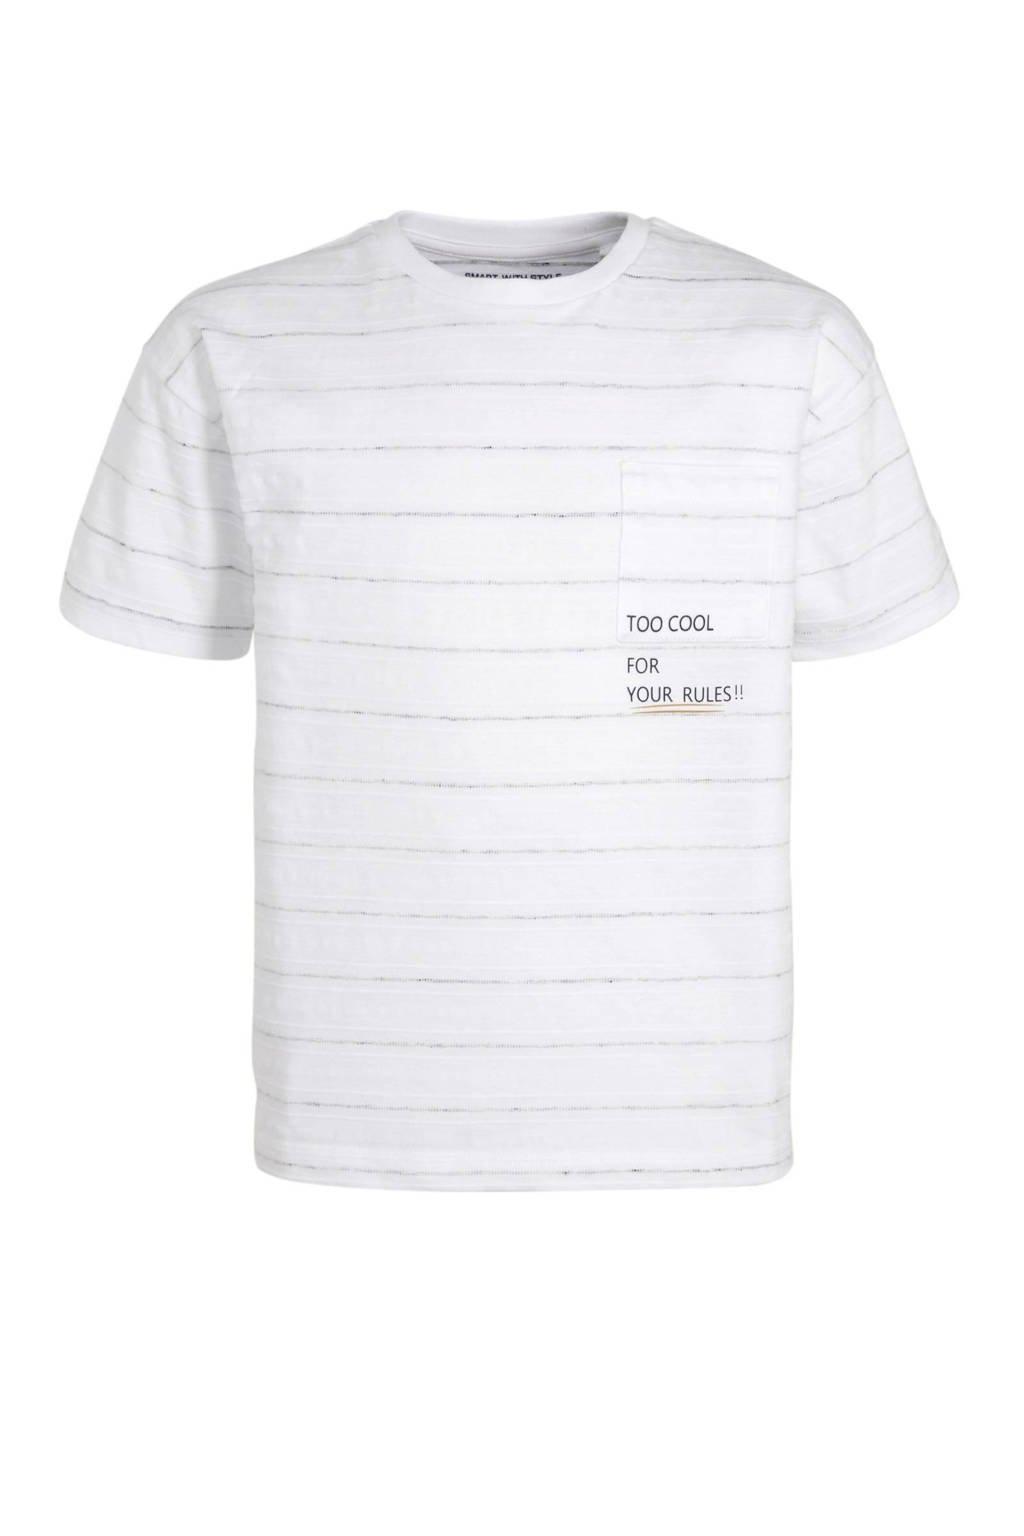 C&A Palomino gestreept T-shirt wit, Wit